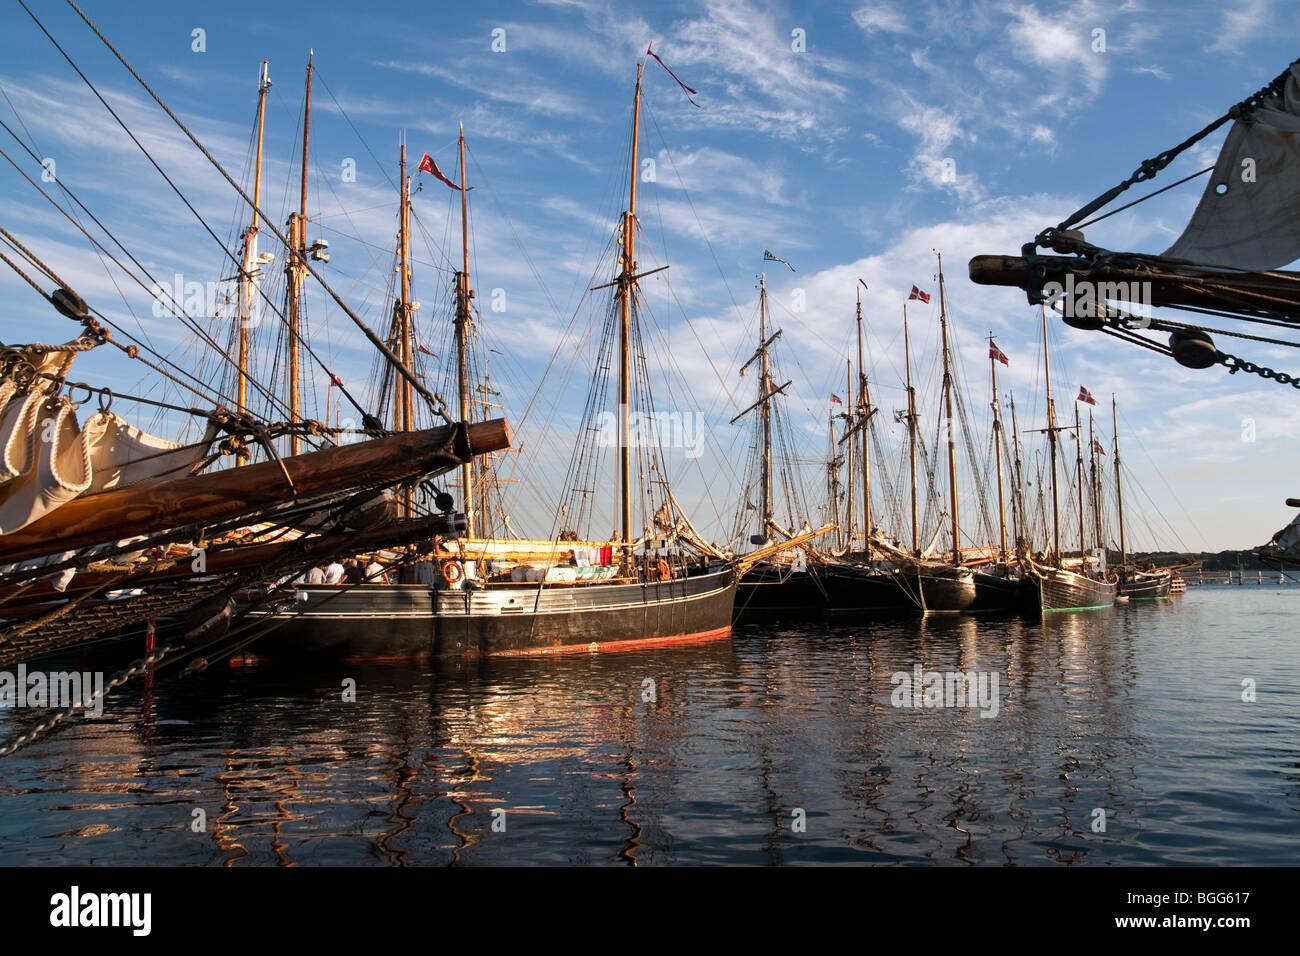 old sailing ships at faaborg harbor denmark stock photo 27400835